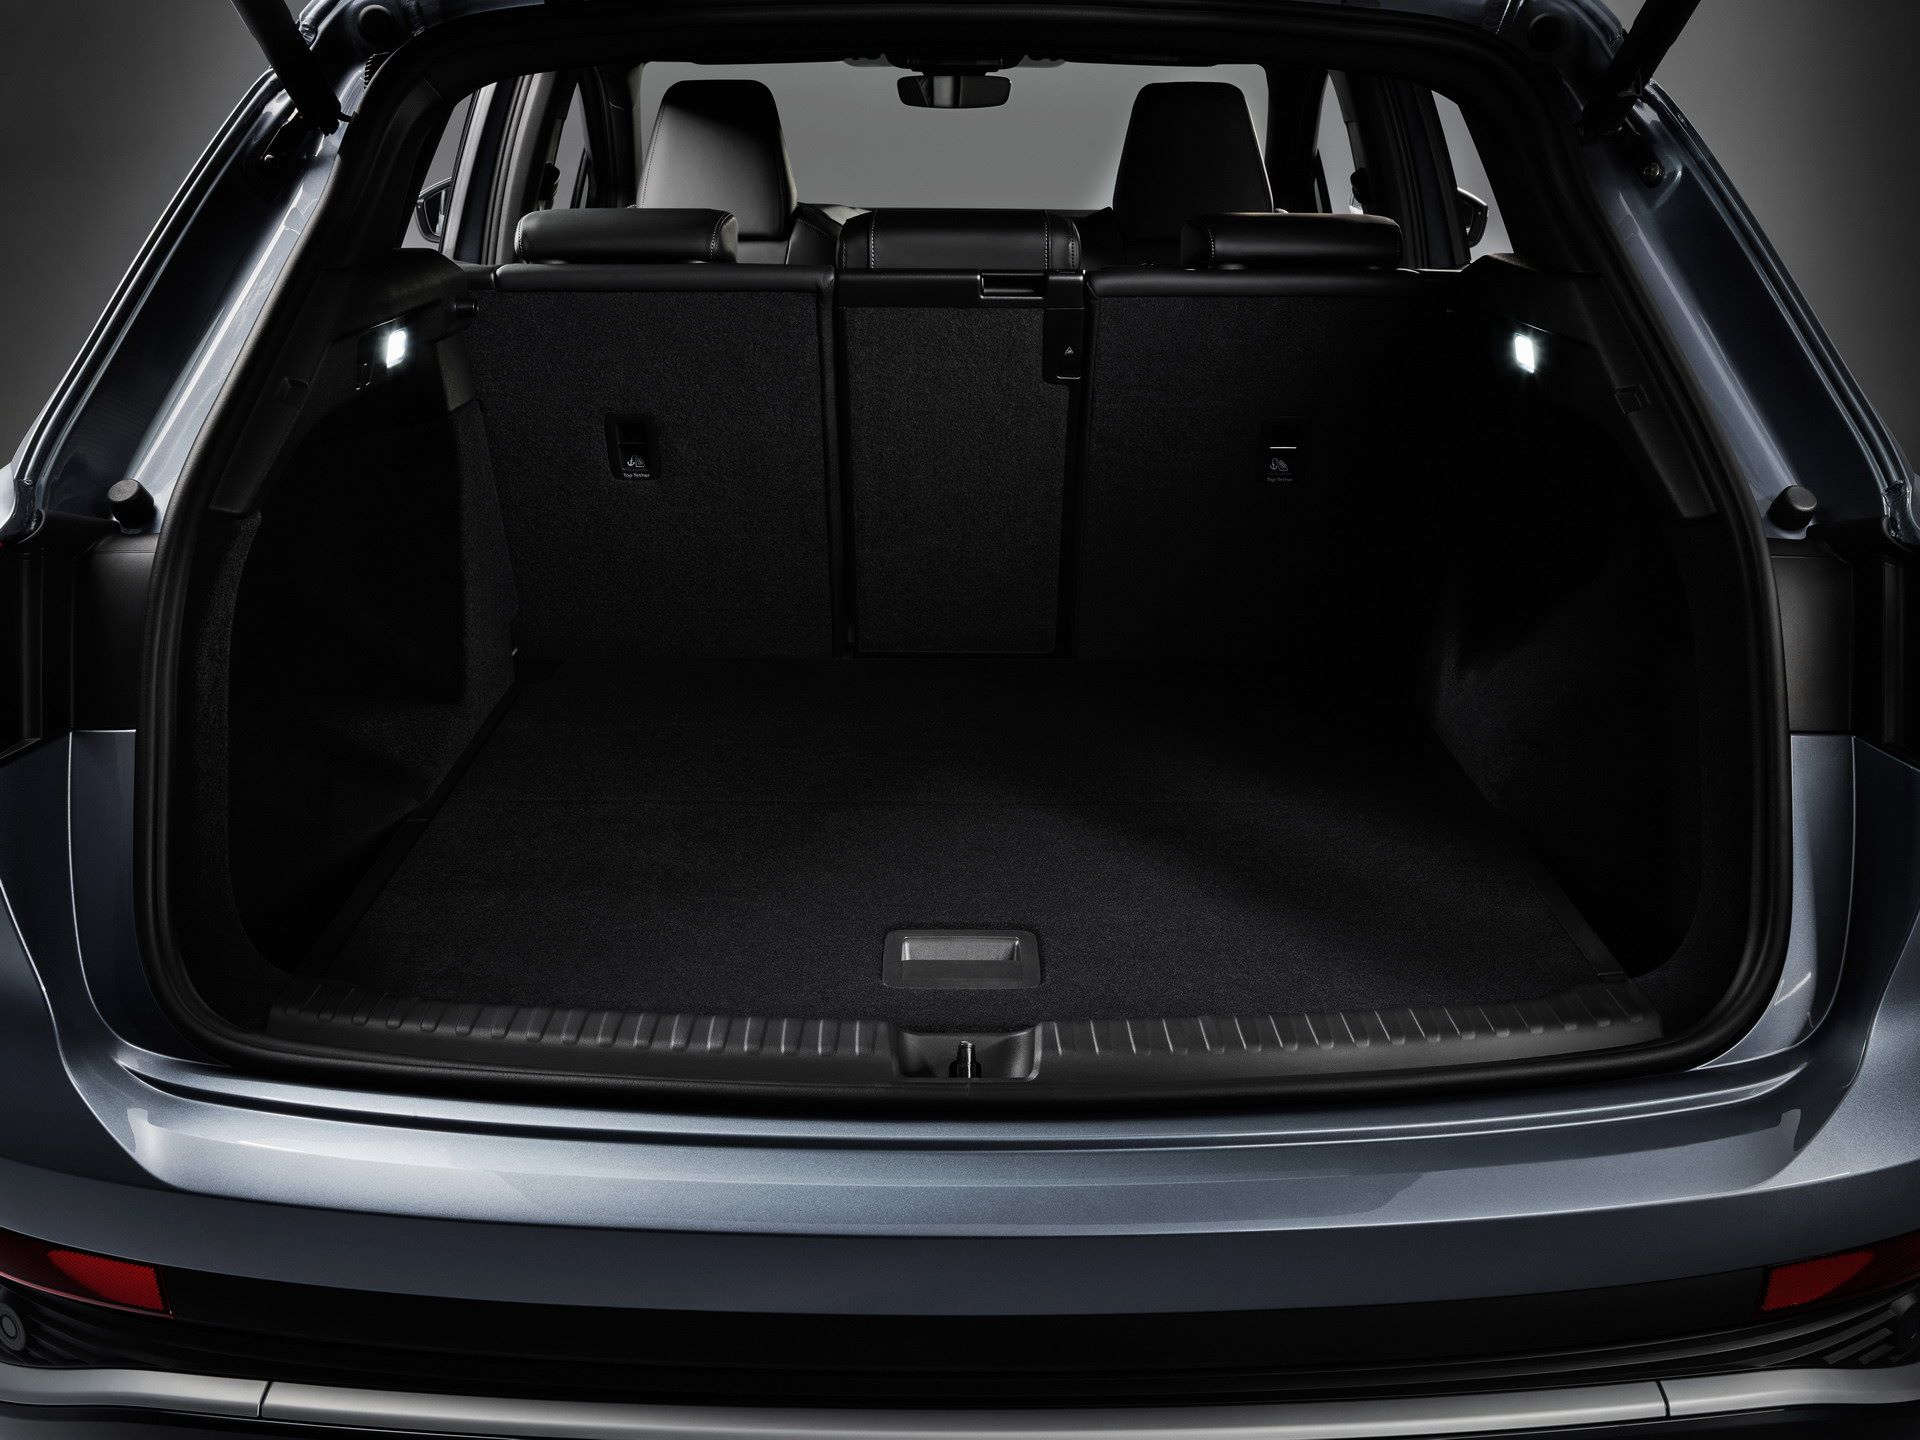 Audi-Q4-e-tron-and-Q4-e-tron-Sportback-73